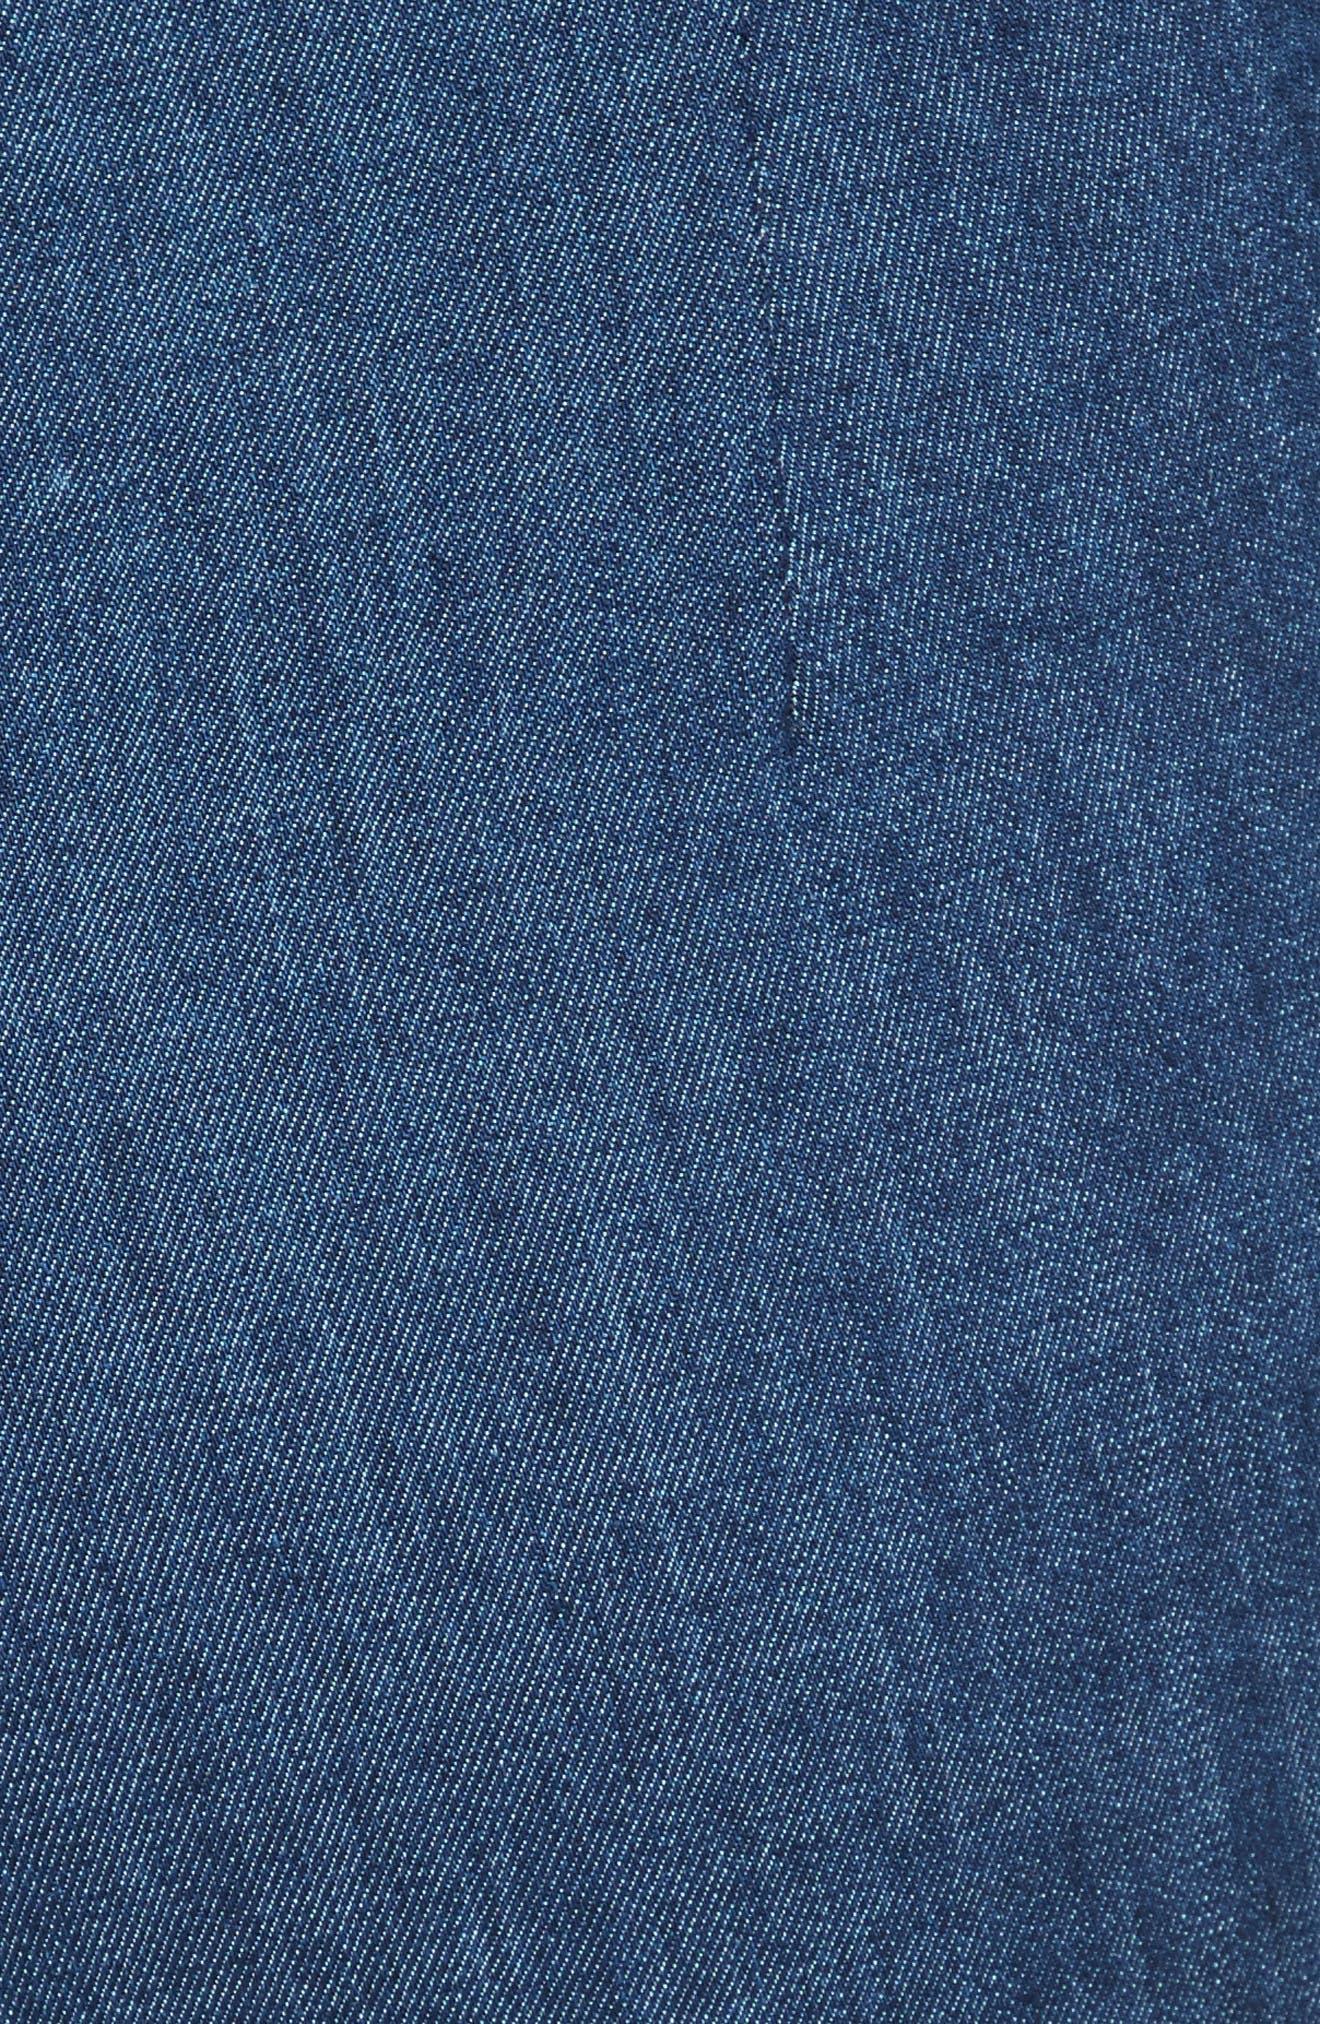 Simone Slim Ankle Pants,                             Alternate thumbnail 5, color,                             Mid Blue